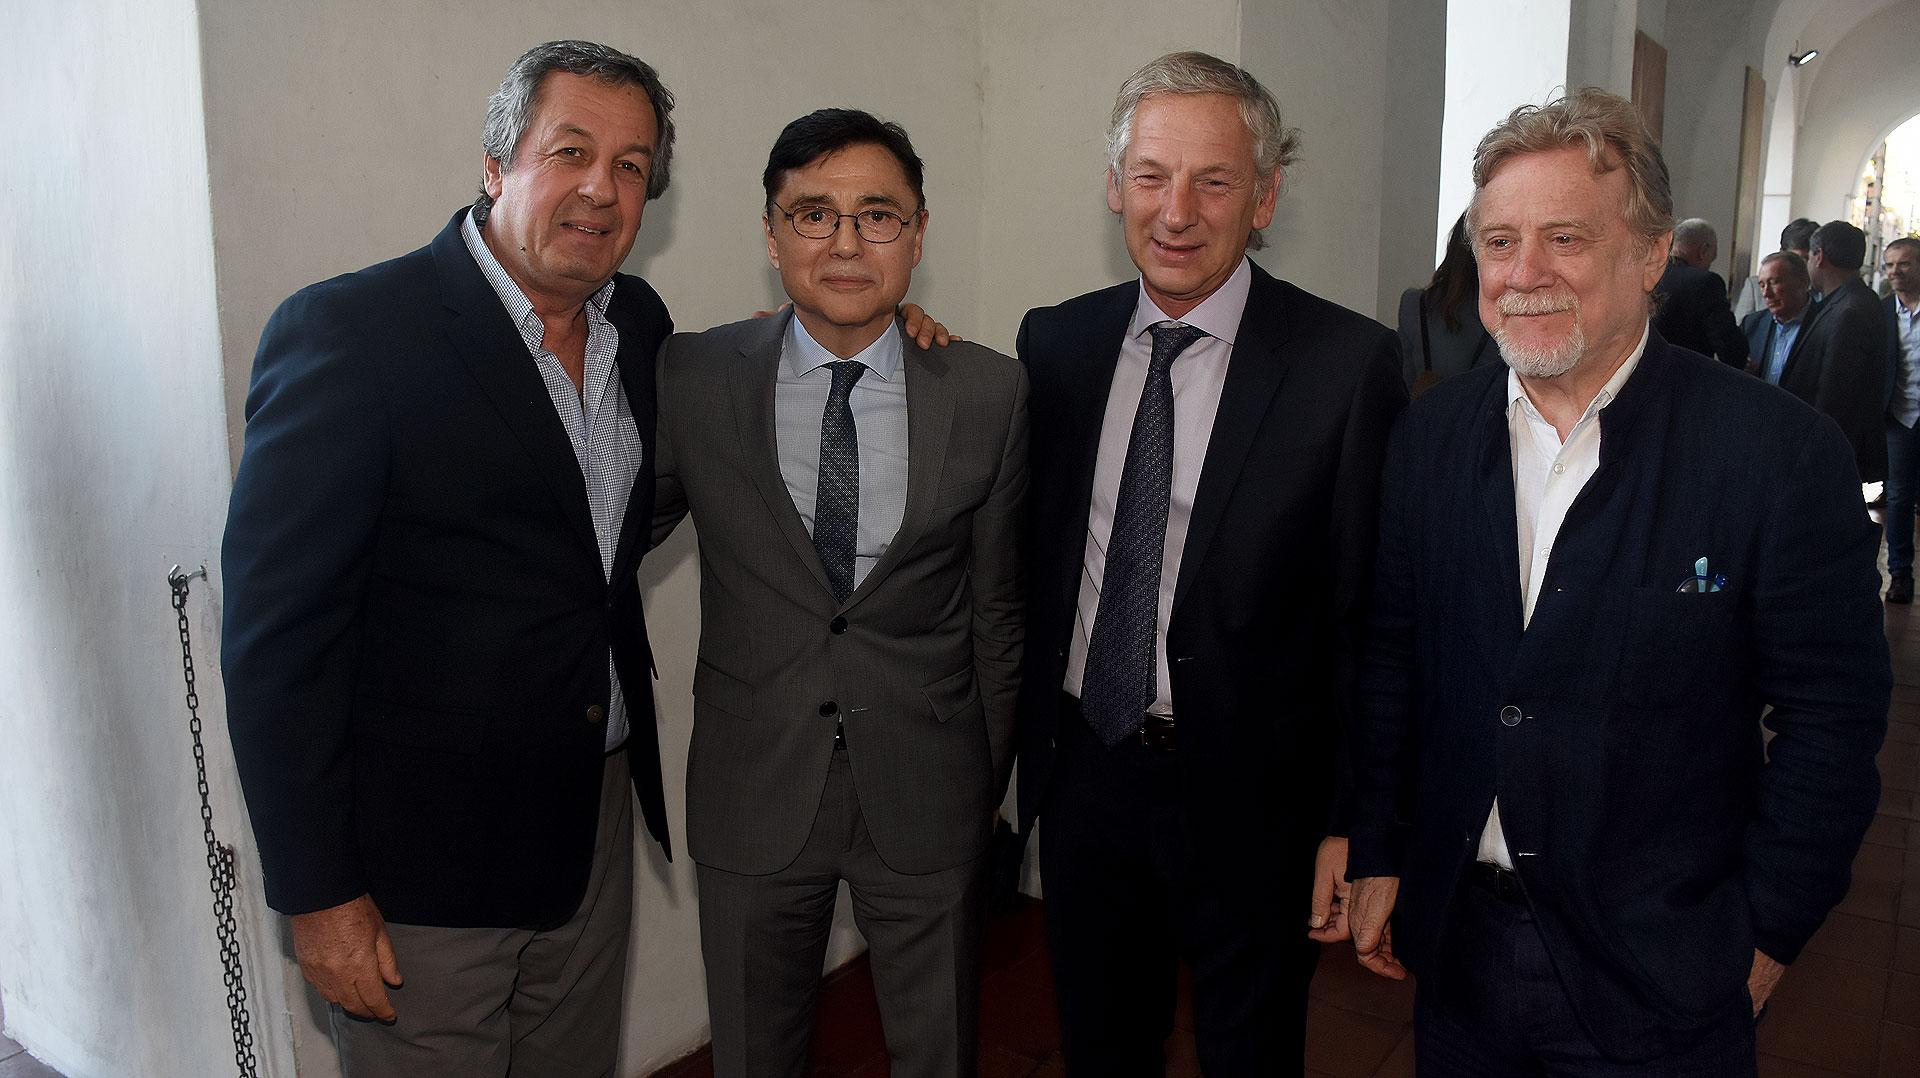 Jorge Porta, Jorge Fontevecchia, Marcelo Longobardi y Ricardo Kirschbaun,editor general del diario Clarín